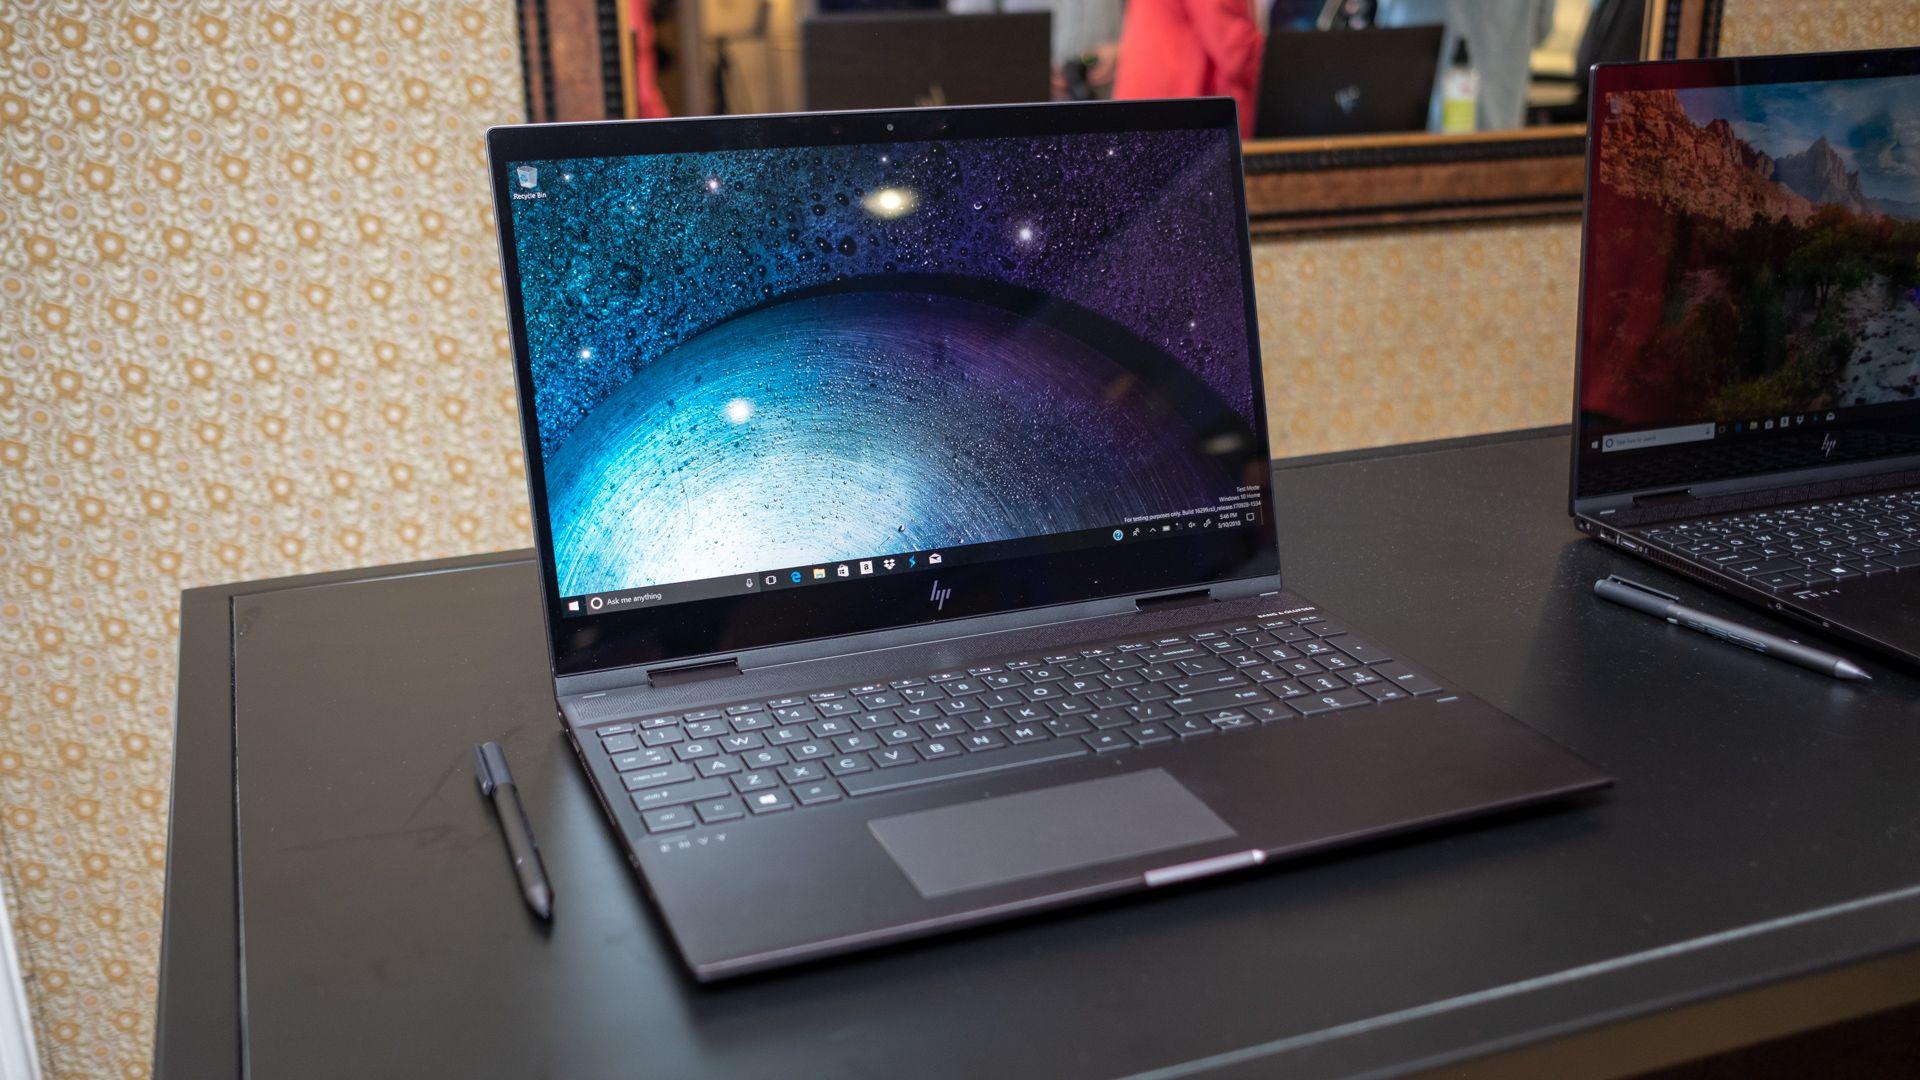 Hp Envy X360 15 2018 Envy Laptop Gadgets Cool Things To Make